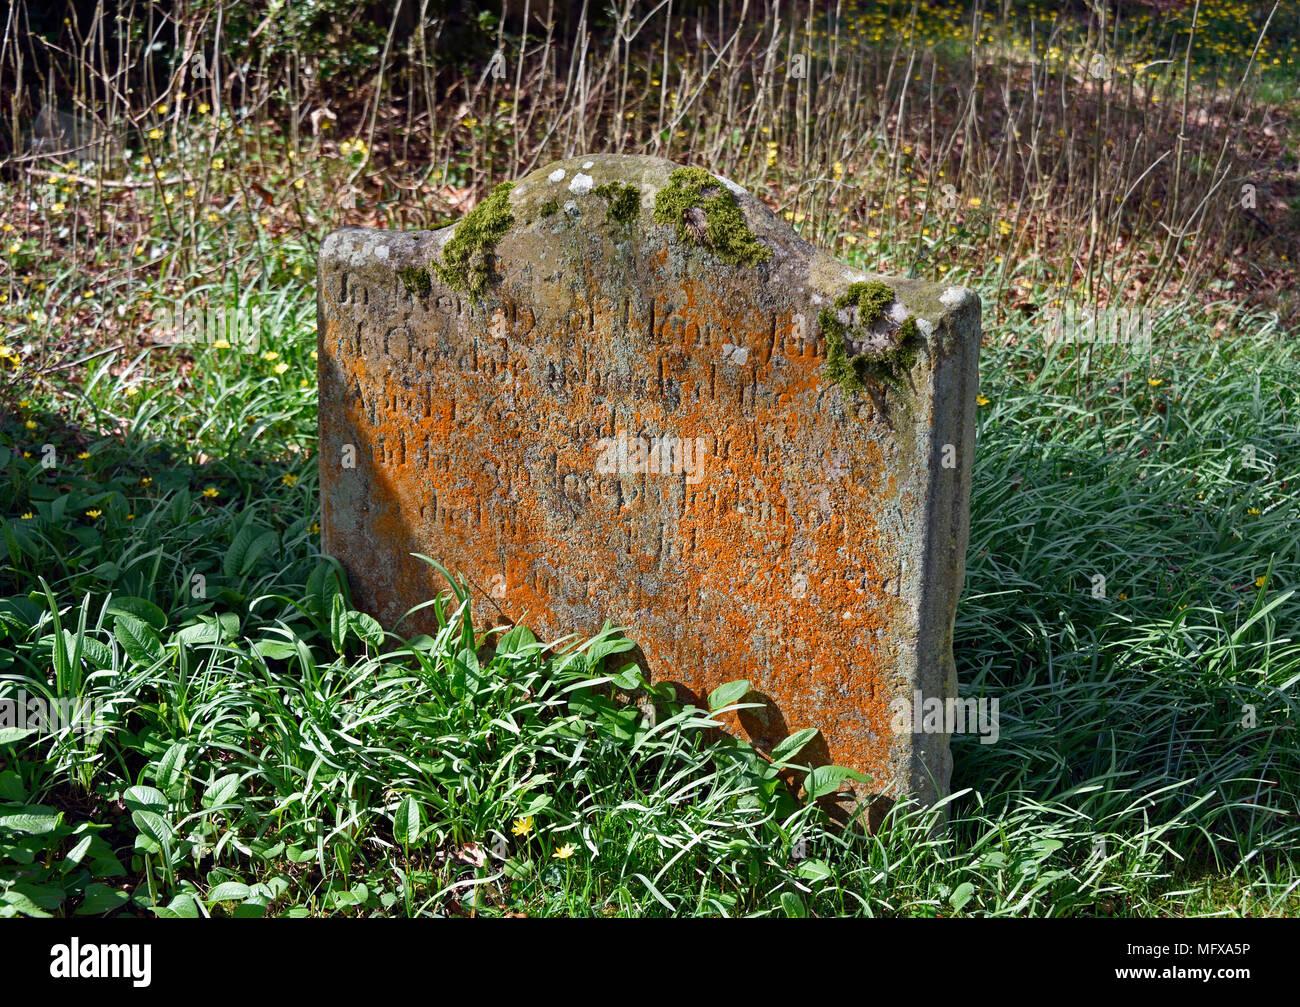 Gravestone with orange coloured lichen. Church of Saint Mary. Ennerdale Bridge, Lake District National Park, Cumbria, England, United Kingdom, Europe. - Stock Image